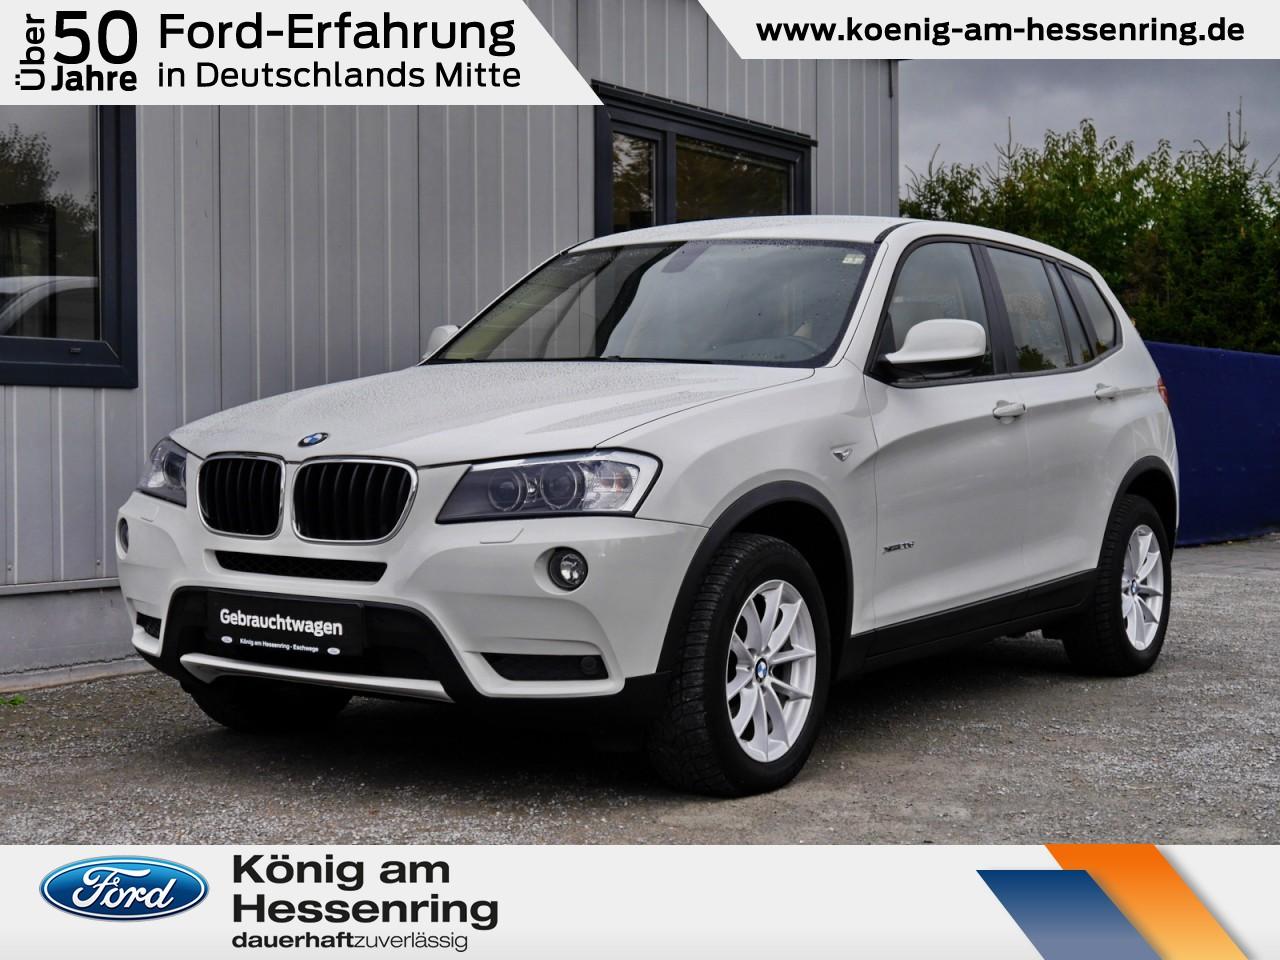 BMW X3 xDrive 20d Leder+Xenon+PDC+NAV+AHK+Sitzhzg, Jahr 2012, Diesel